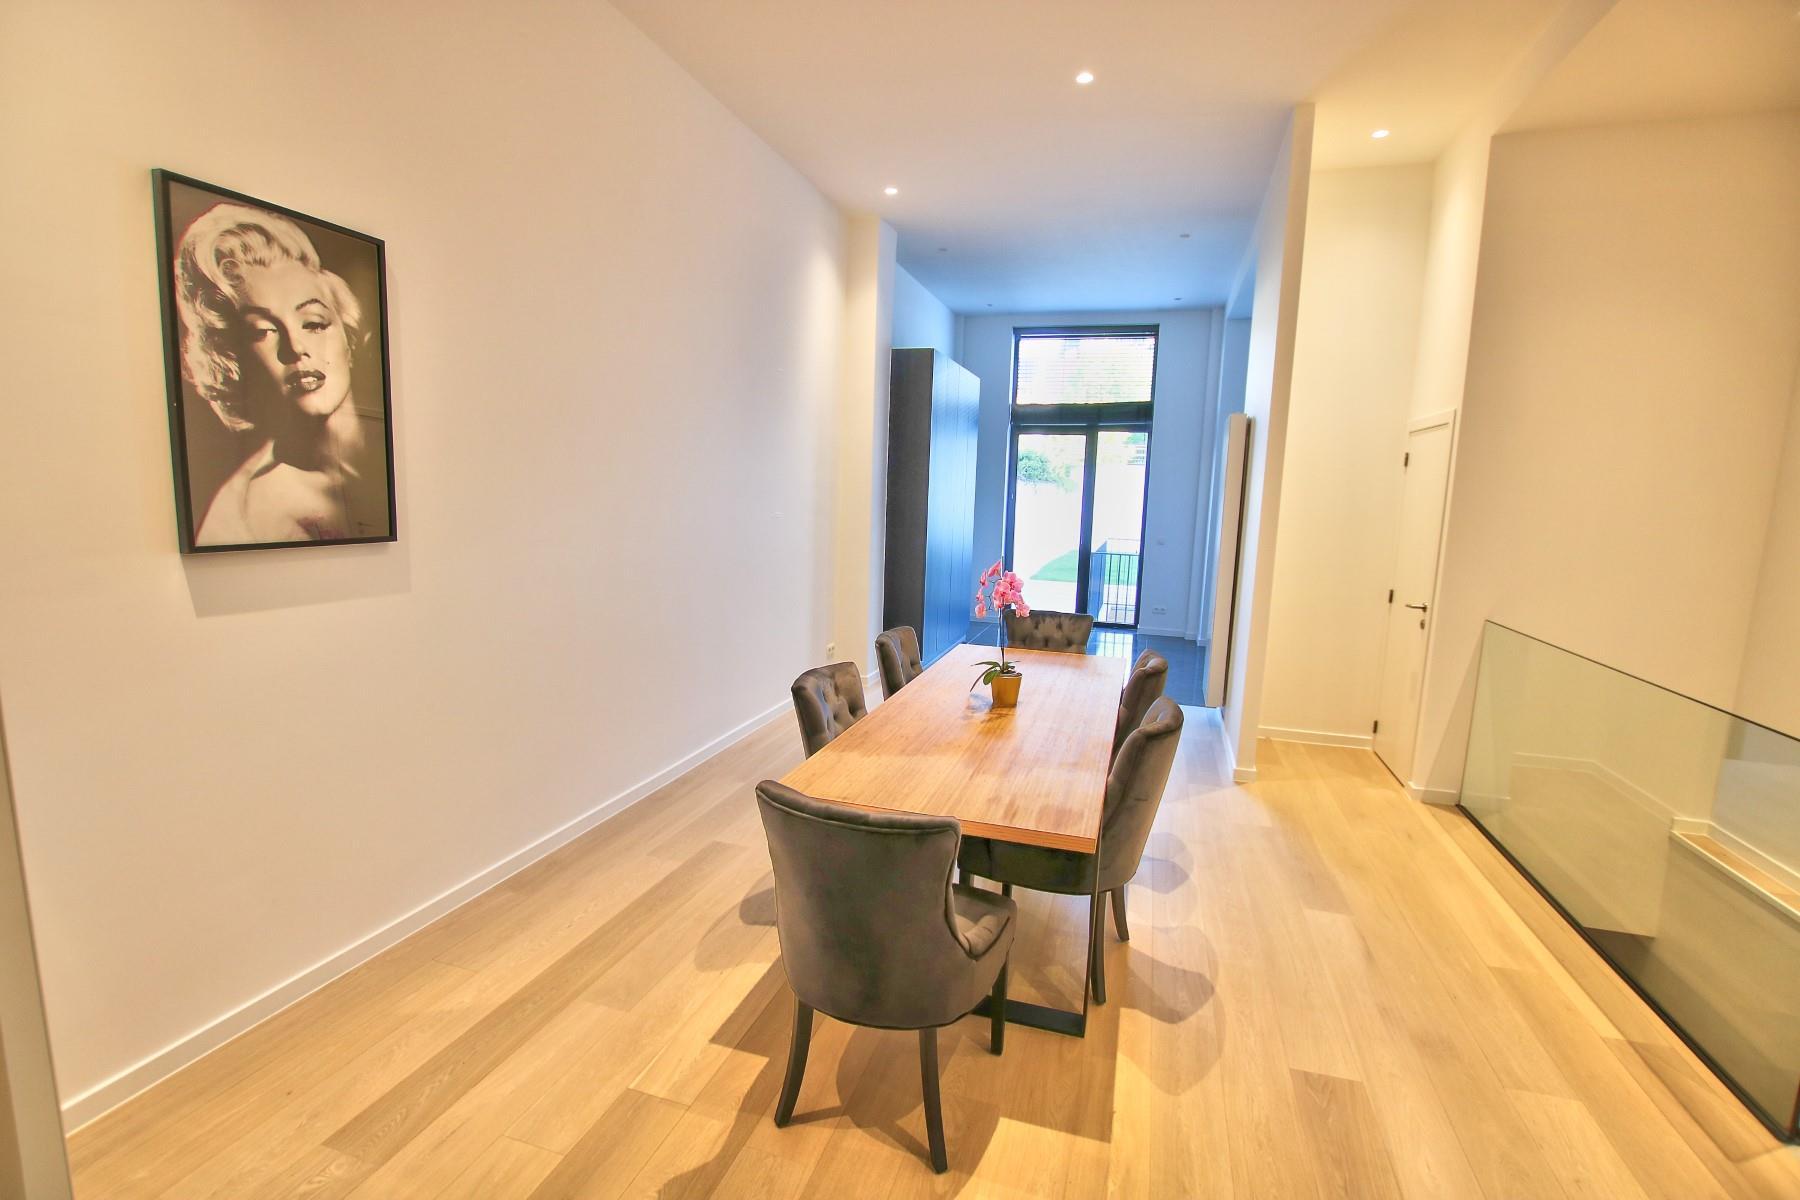 Duplex - Etterbeek - #4202491-2